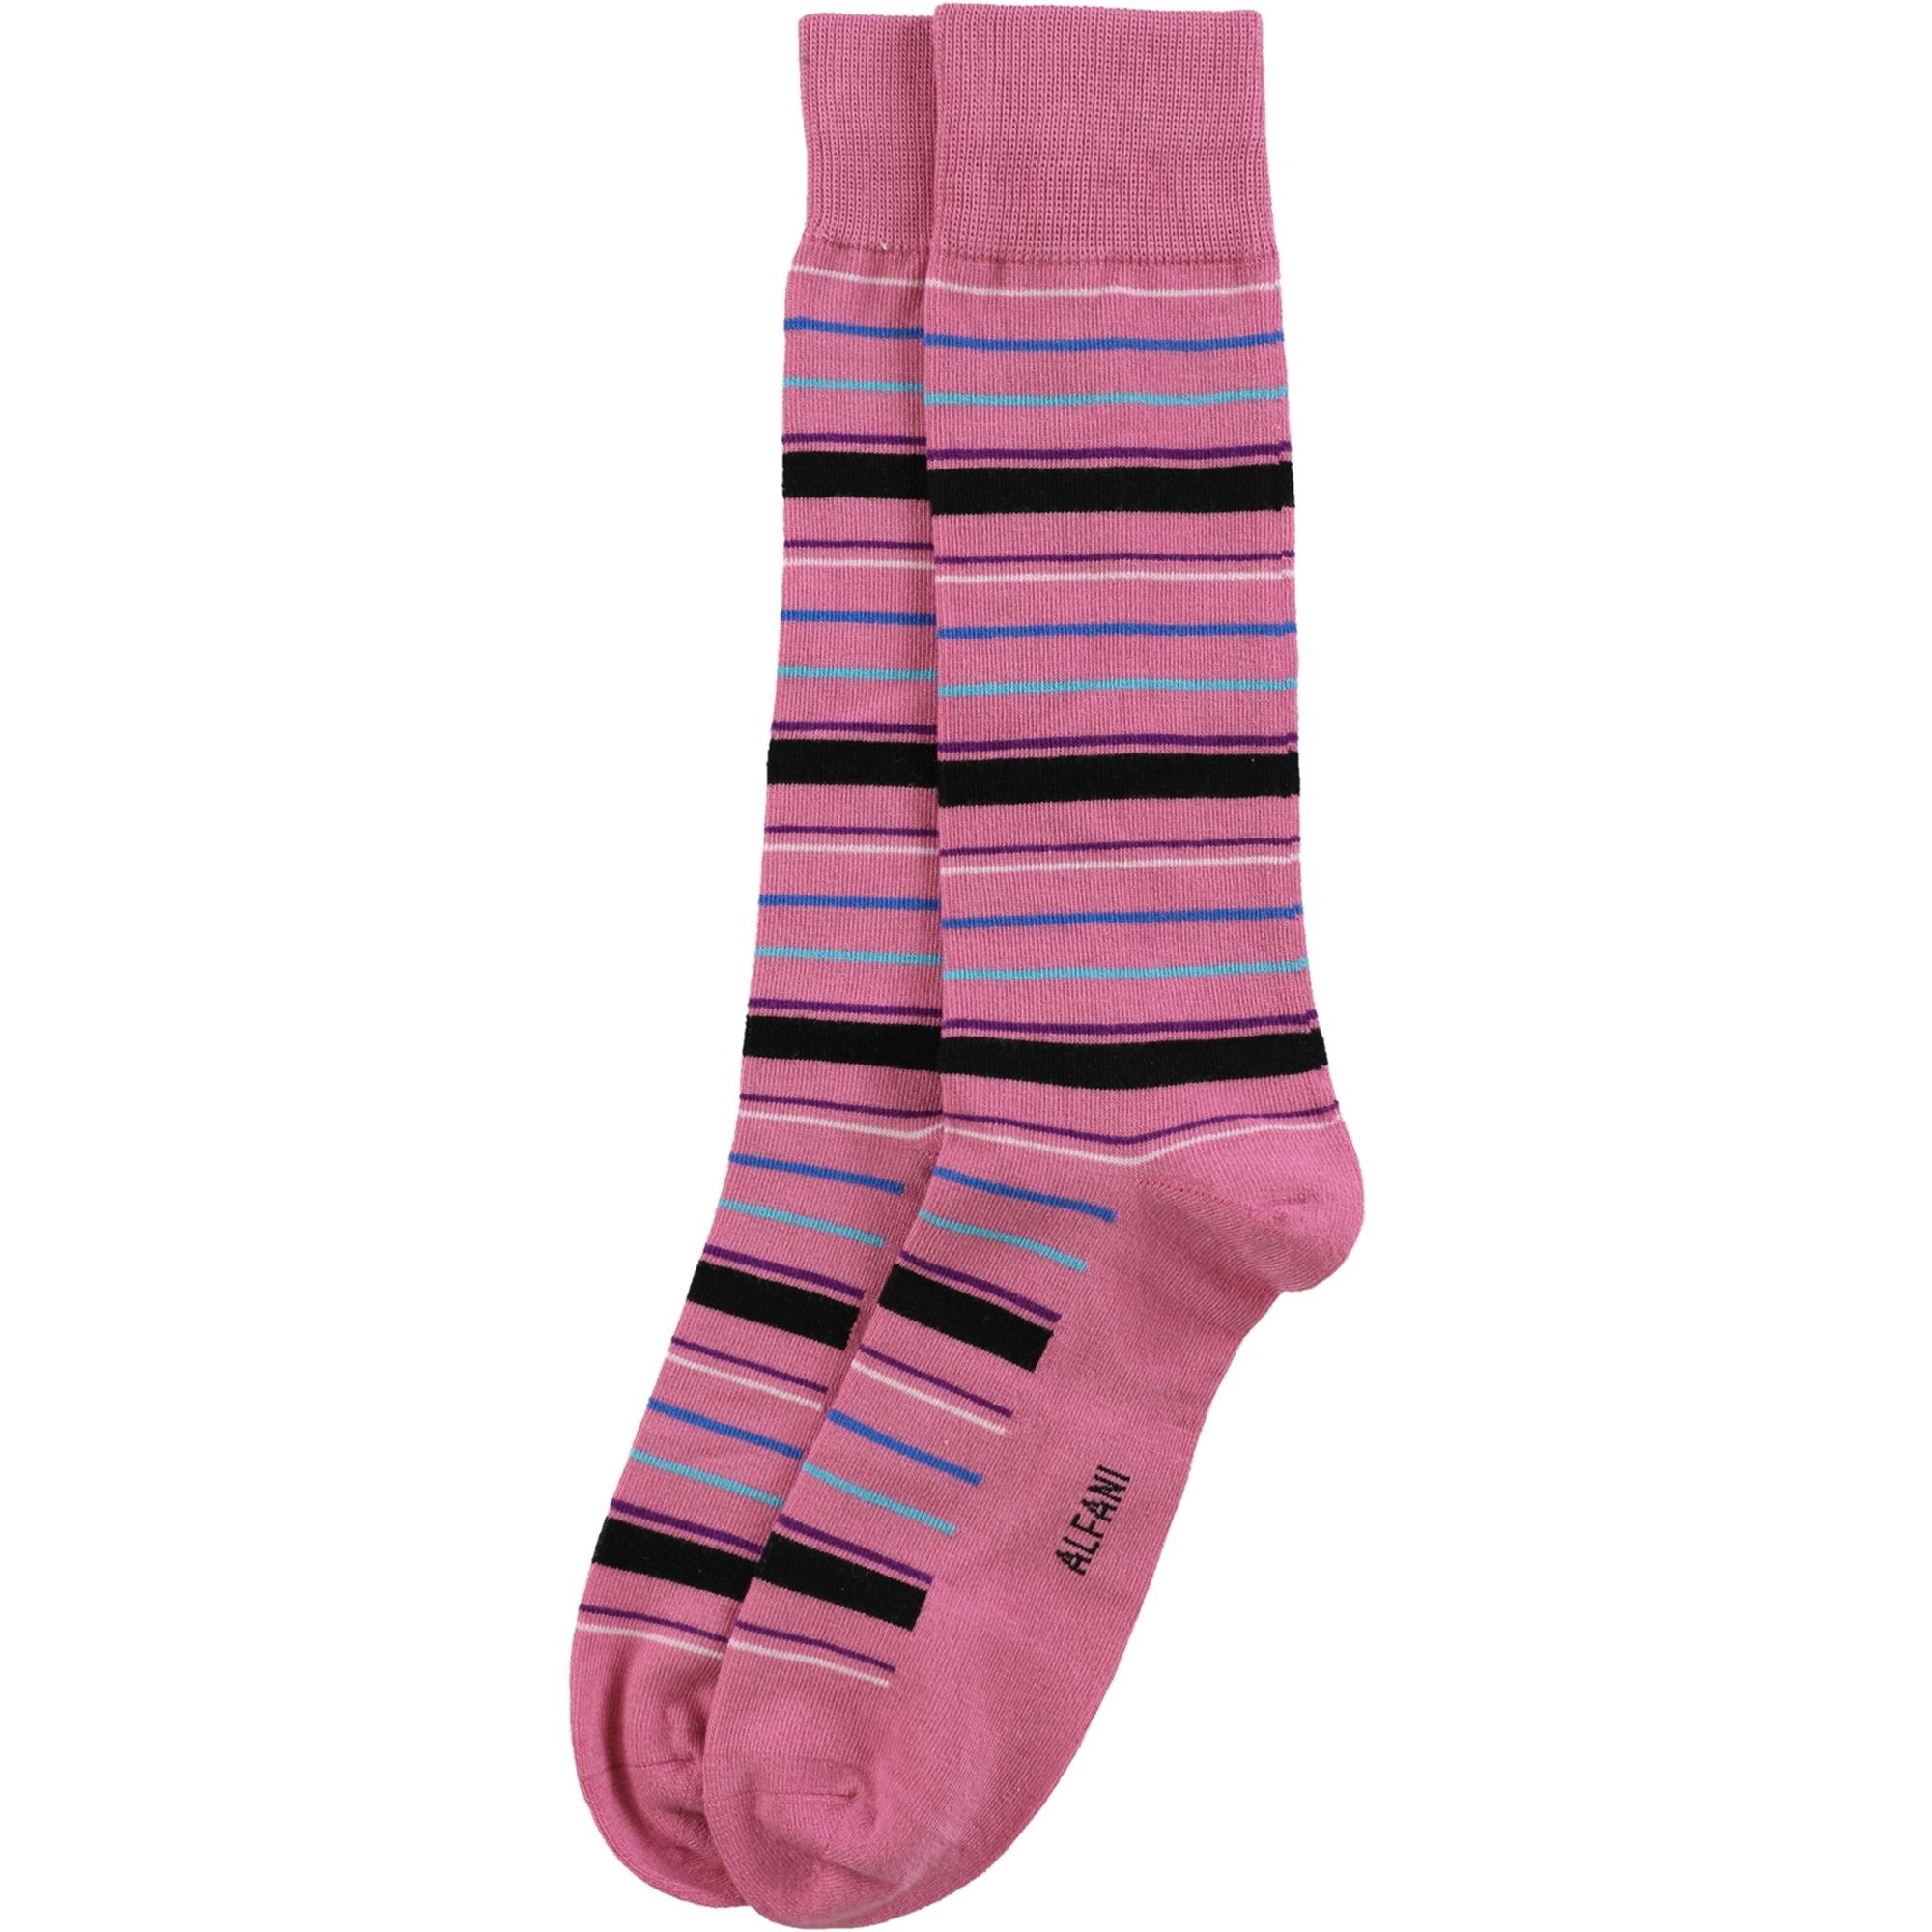 Alfani Mens Variegated Stripe Dress Socks